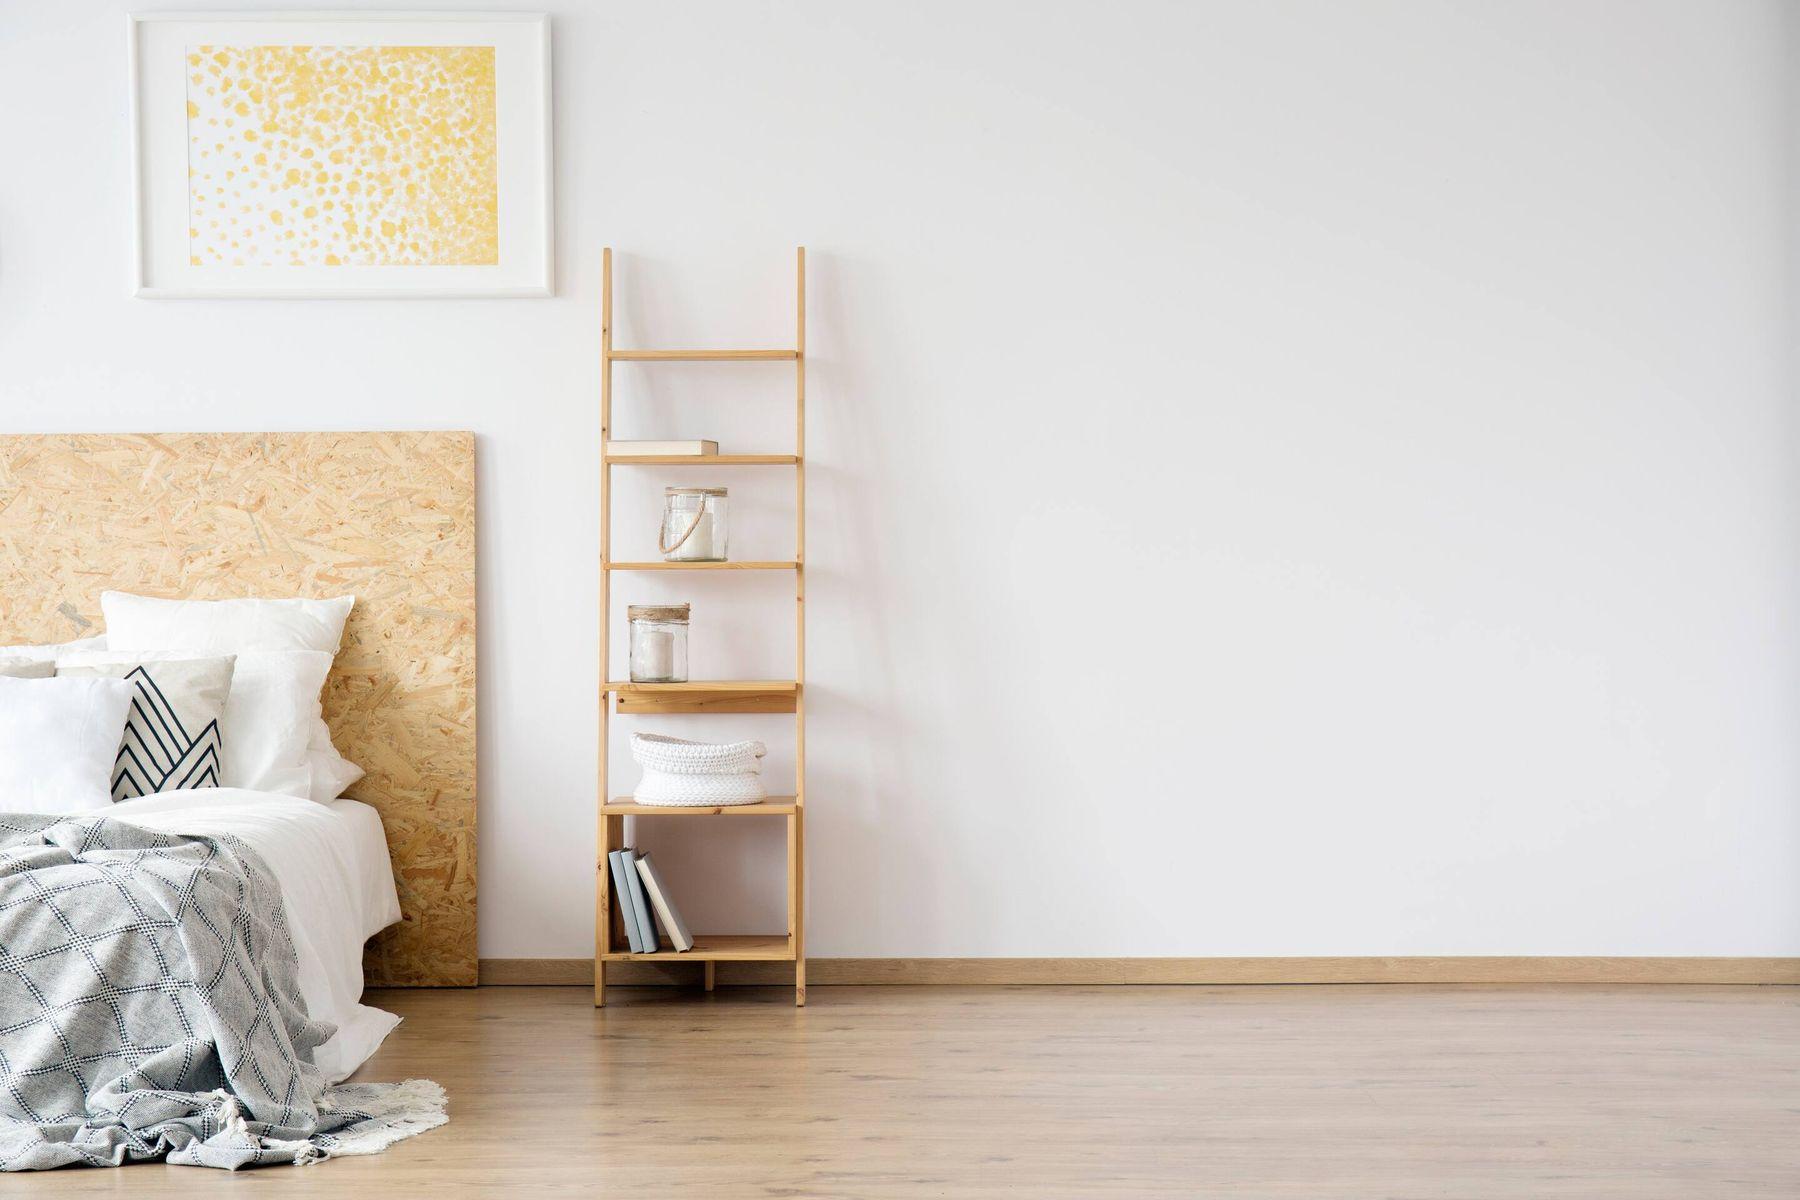 wooden ladder shelf in bedroom